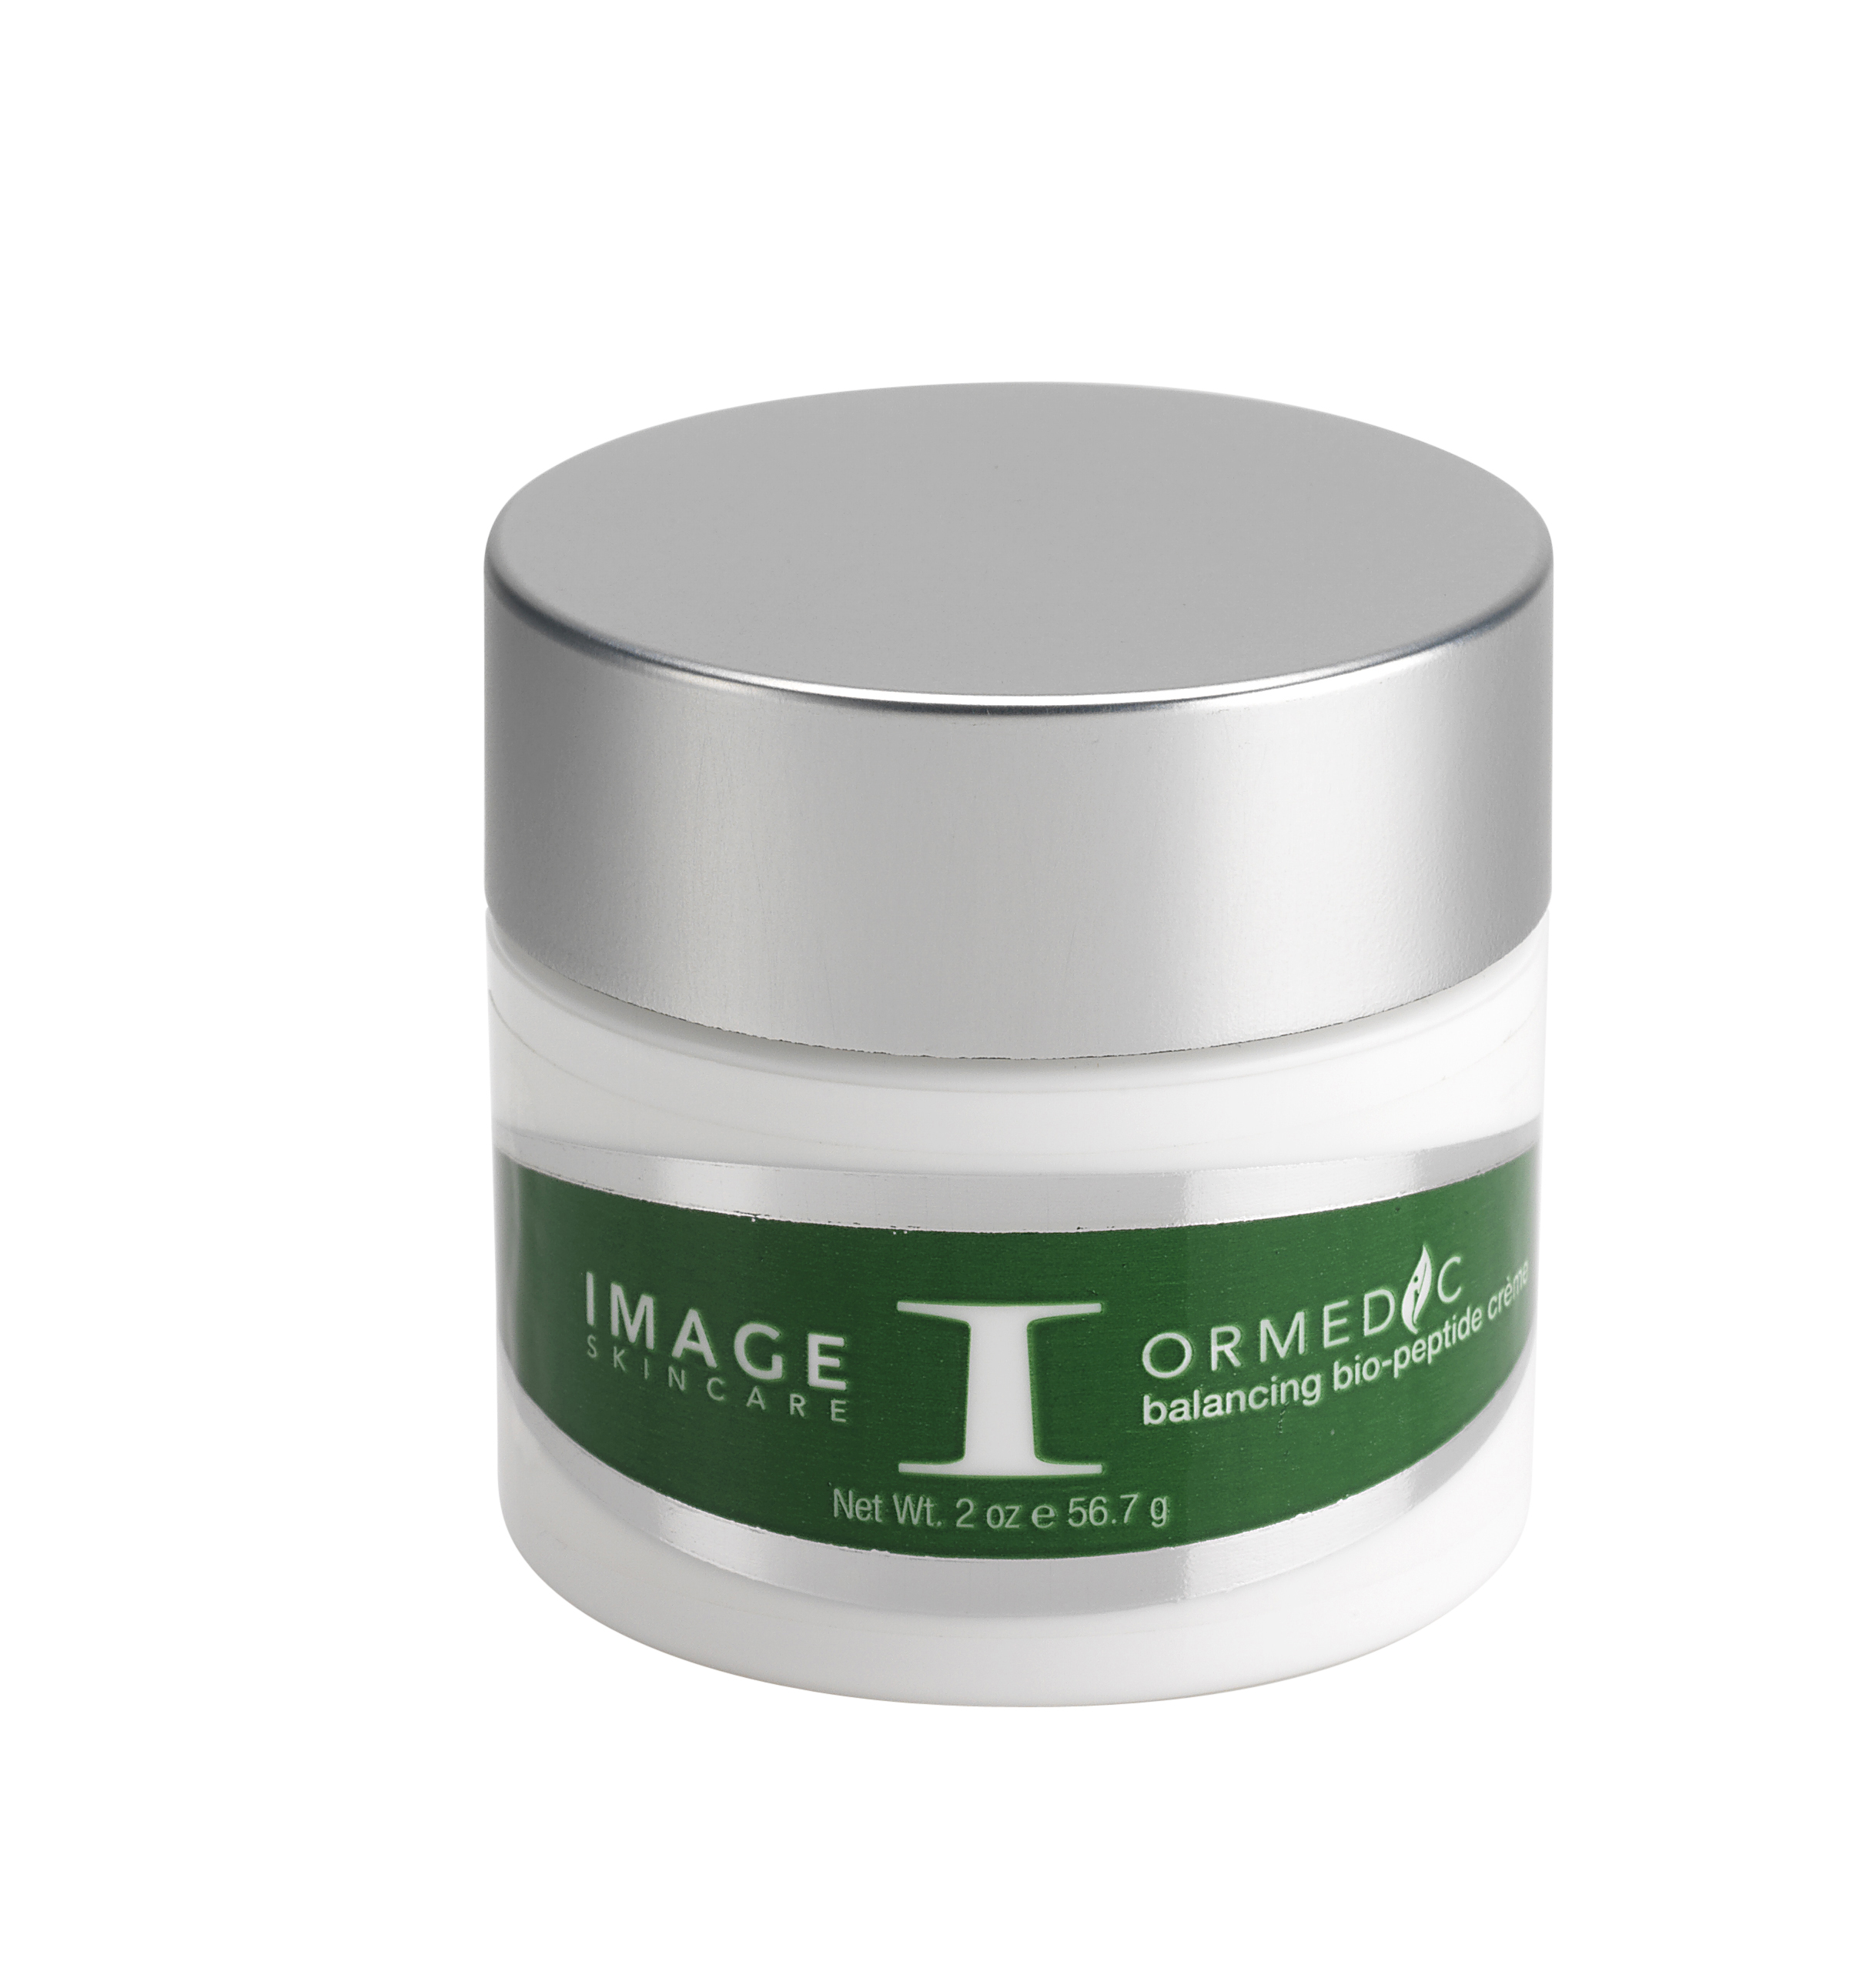 Balancing Bio-Peptide Crème